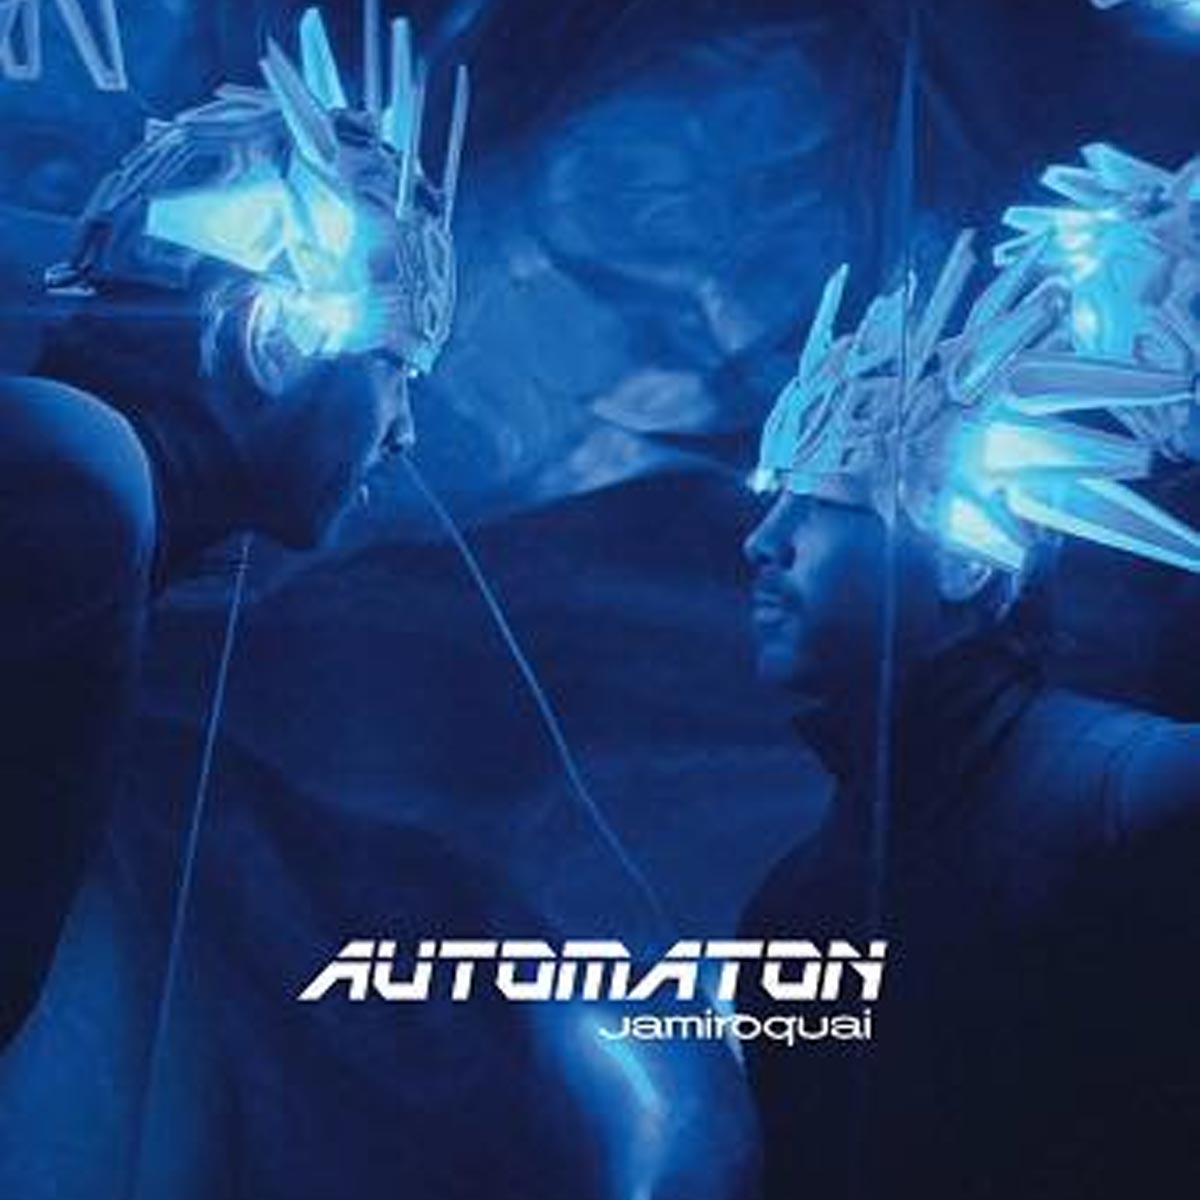 JAMIROQUAI -Automaton